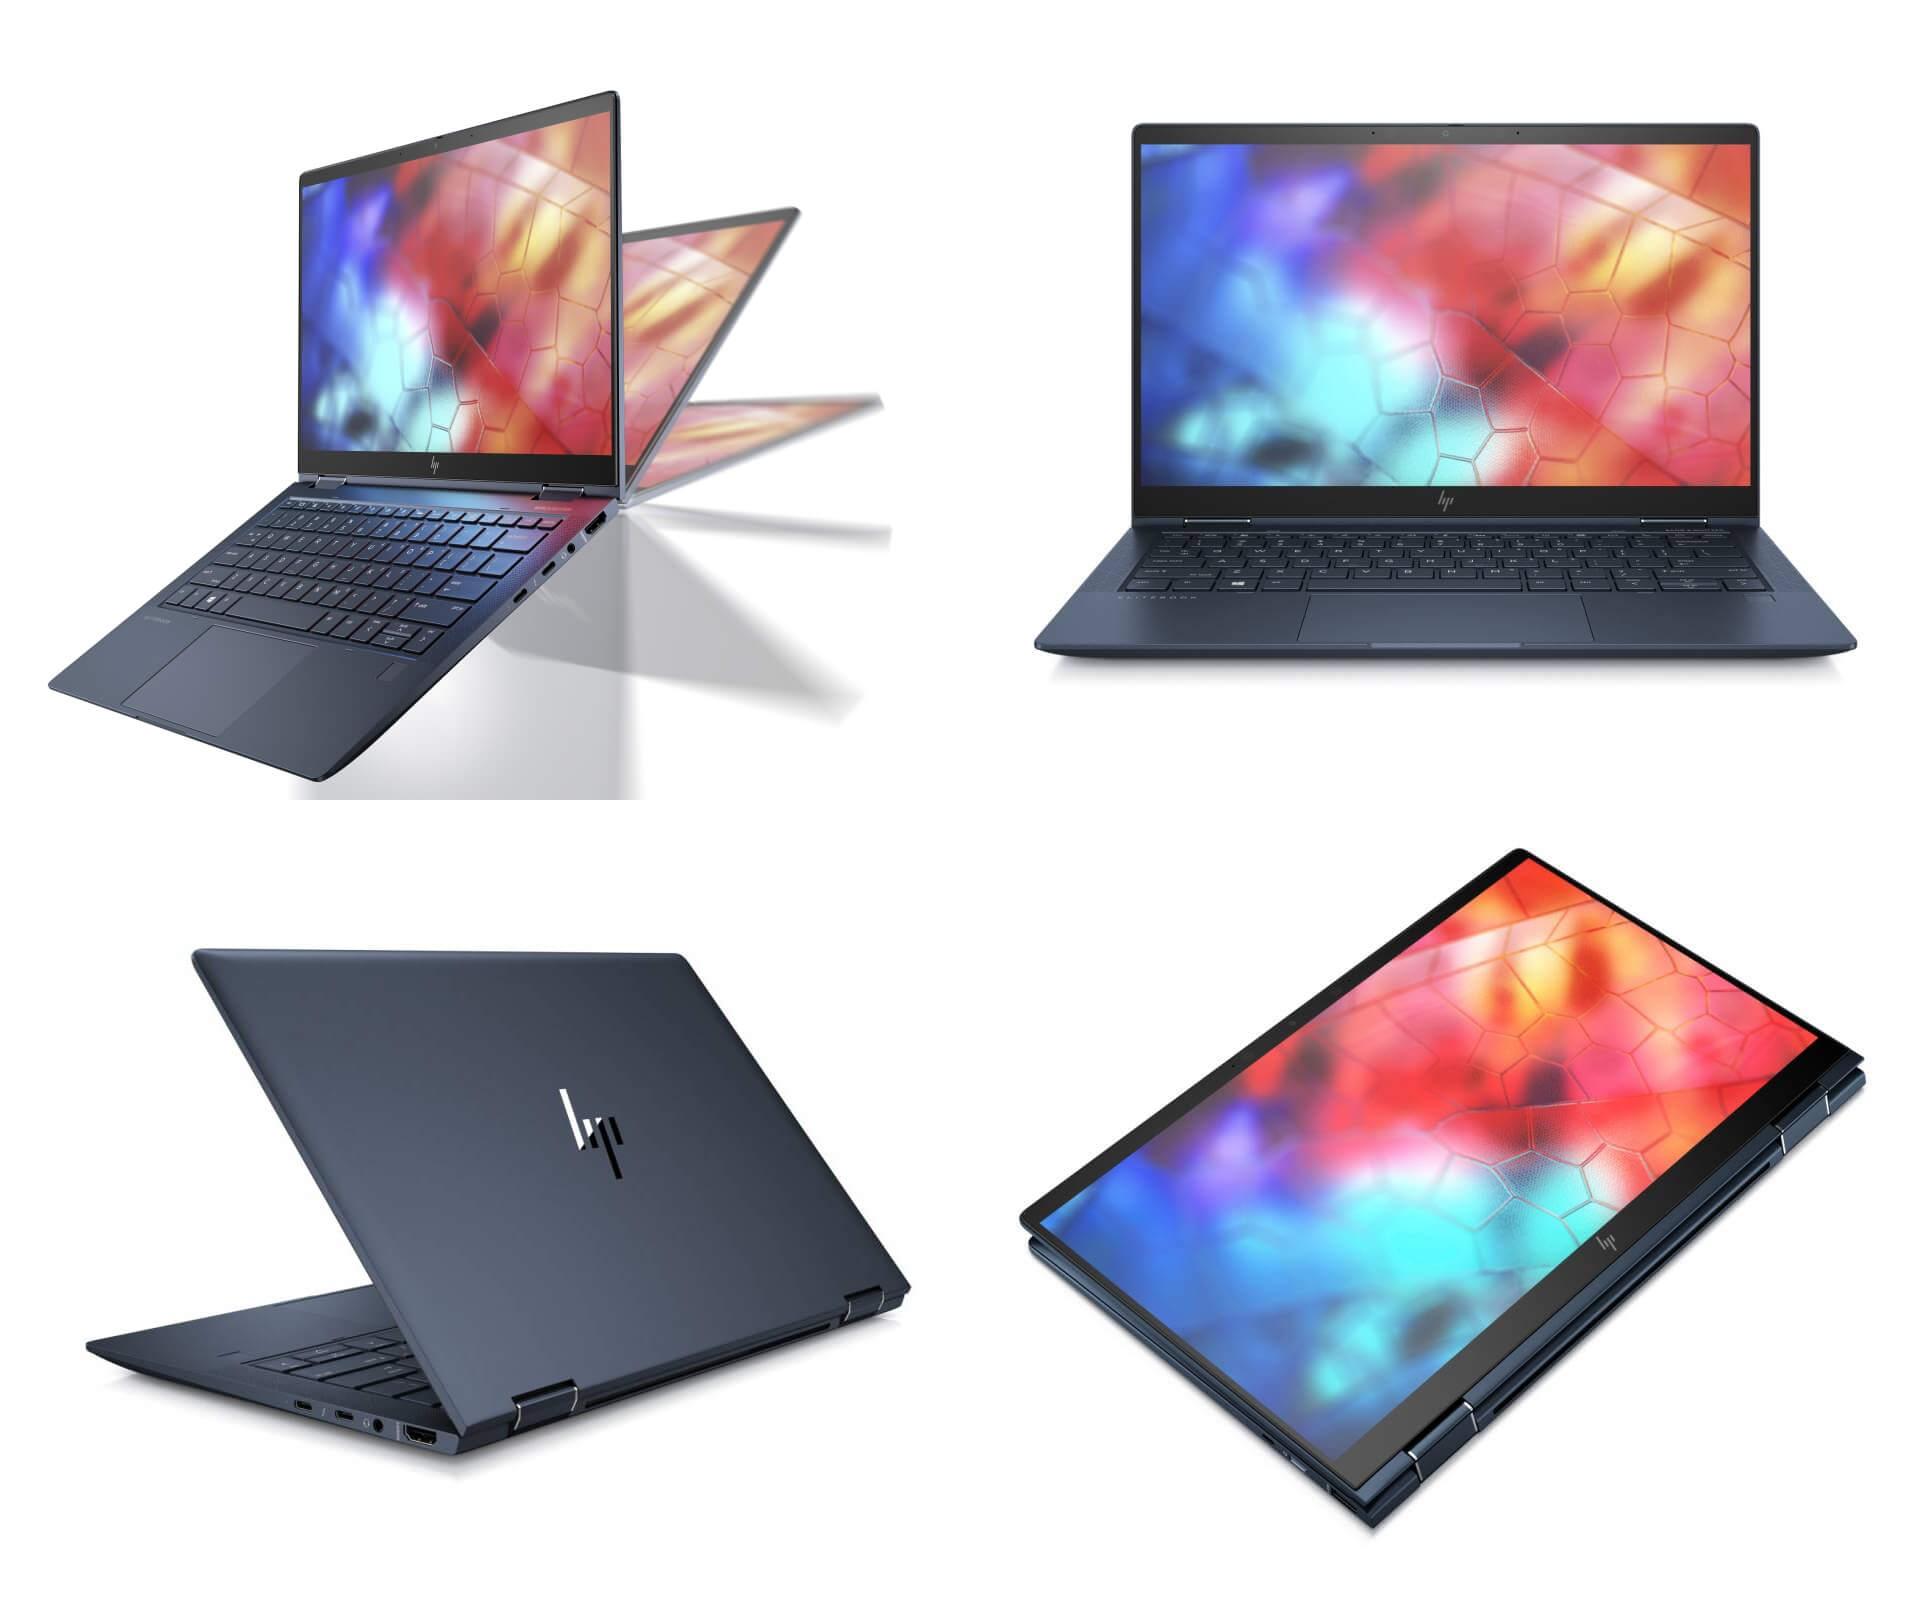 Máy tính xách tay HP Elite Dragonfly 6FW25AV